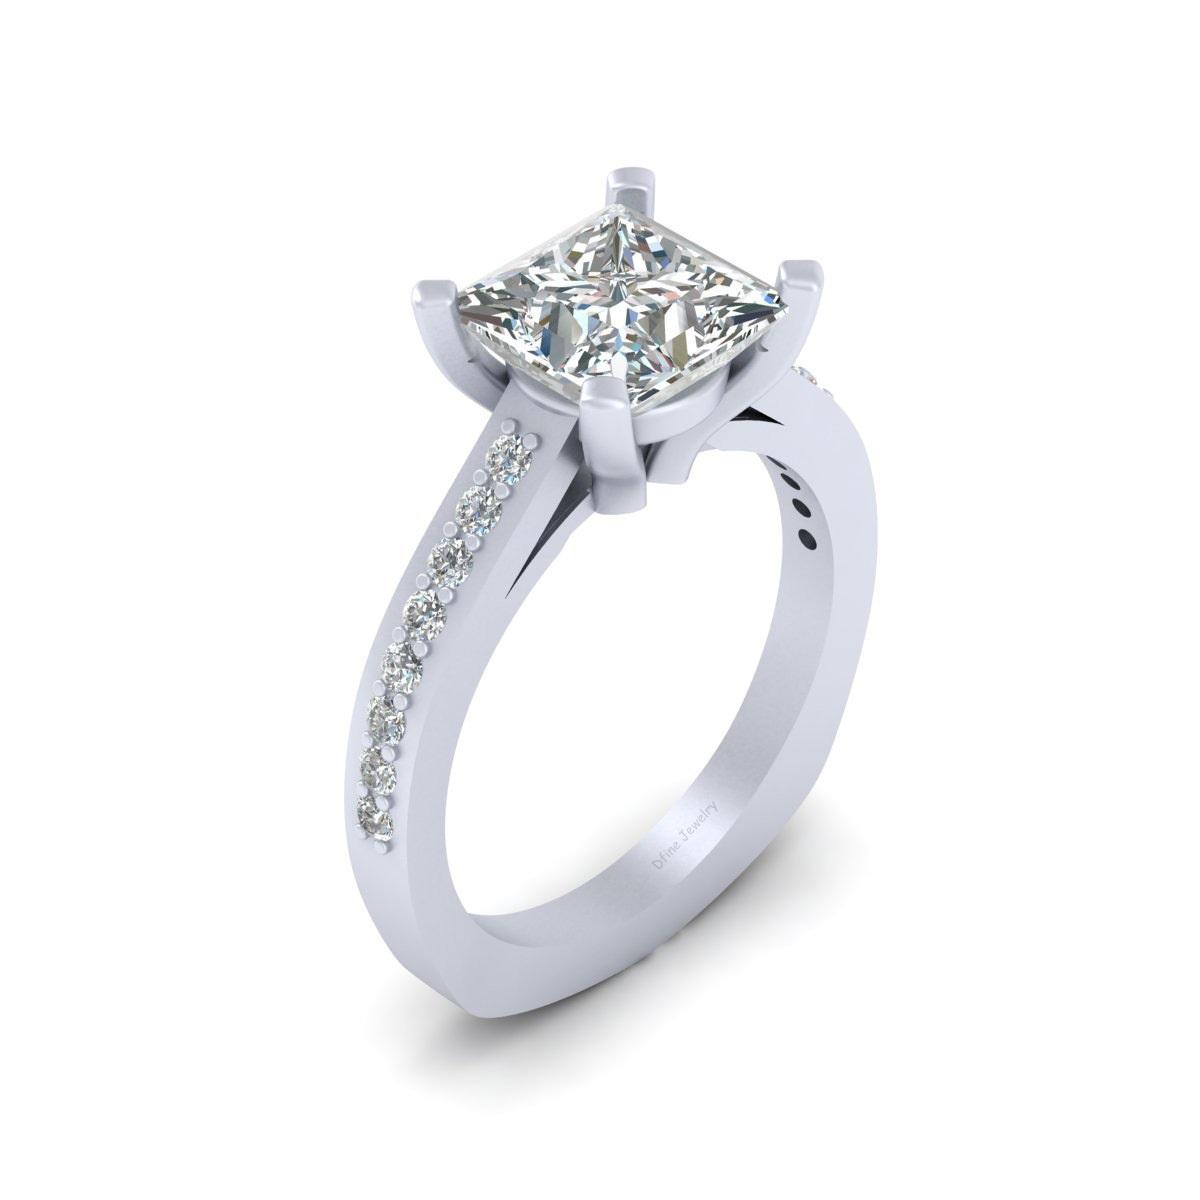 Princess Cut Simulated Diamond Wedding Ring